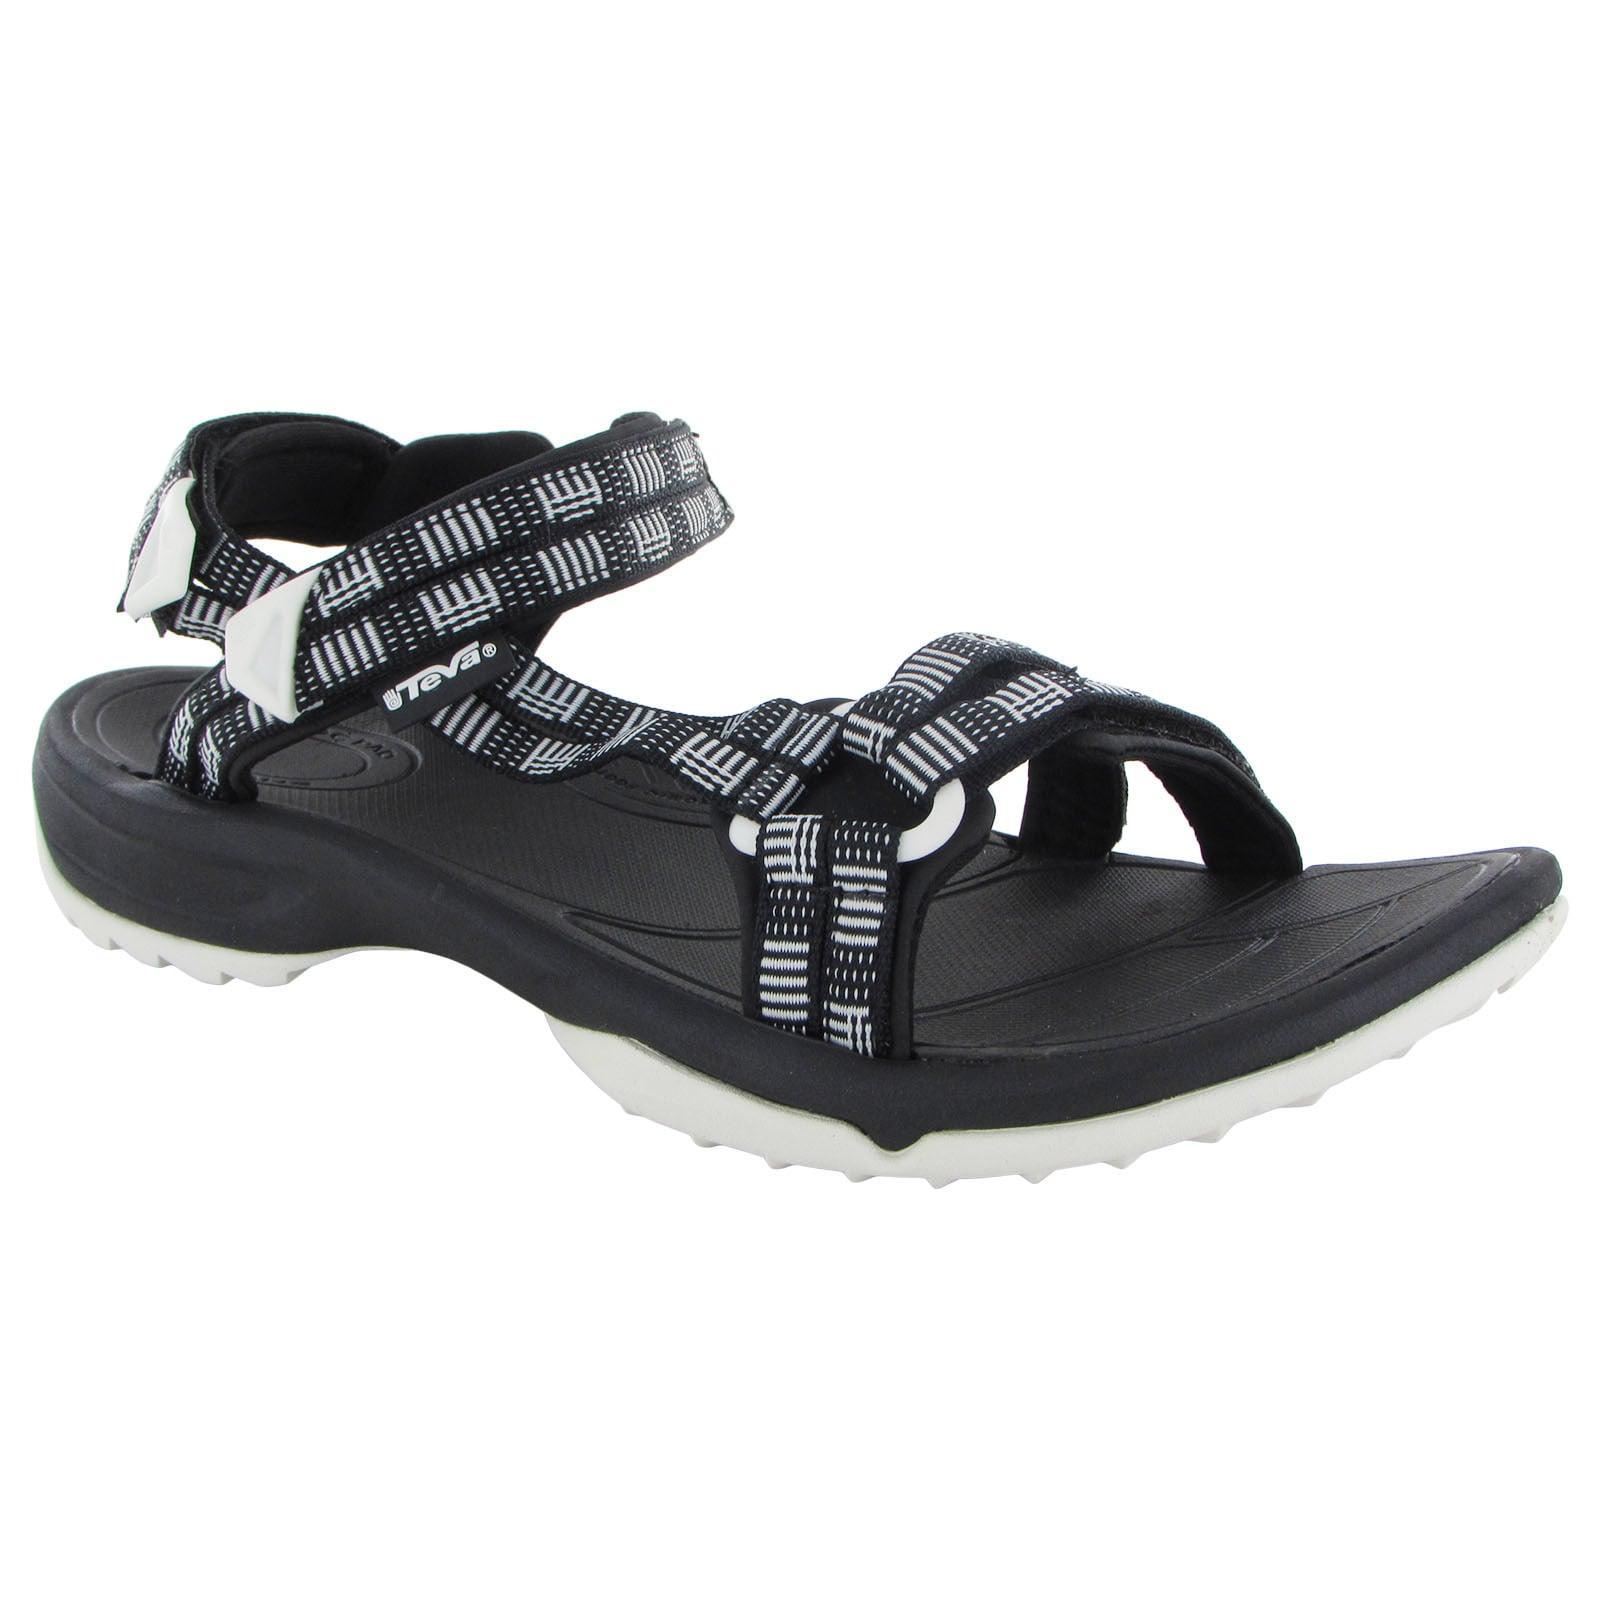 d8cff54899eb Shop Teva Womens Terra Fi Lite Sport Sandals - Free Shipping Today -  Overstock - 19808912